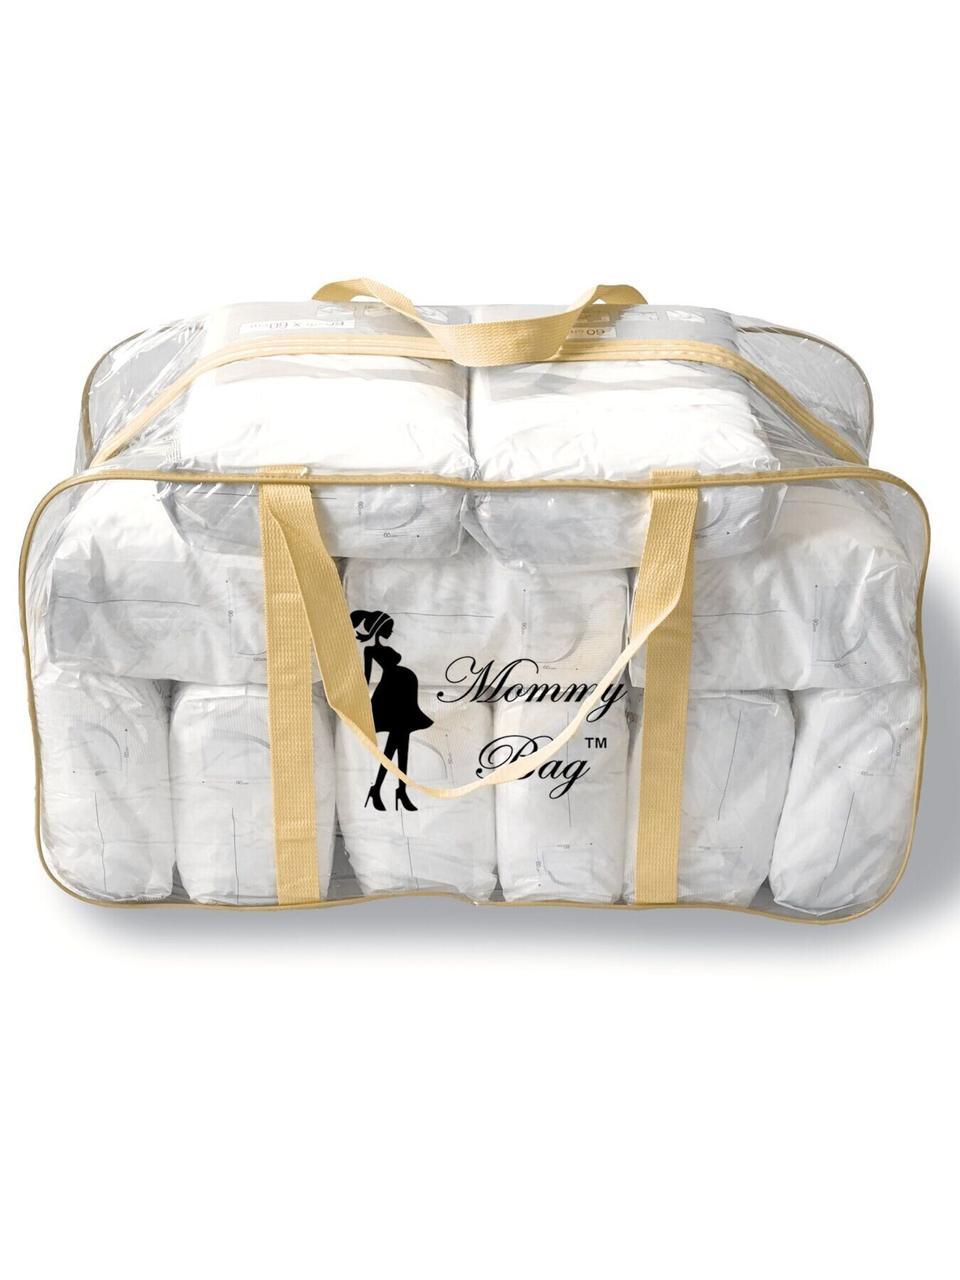 Сумка прозрачная в роддом Mommy Bag, размер - XL, цвет - Бежевый